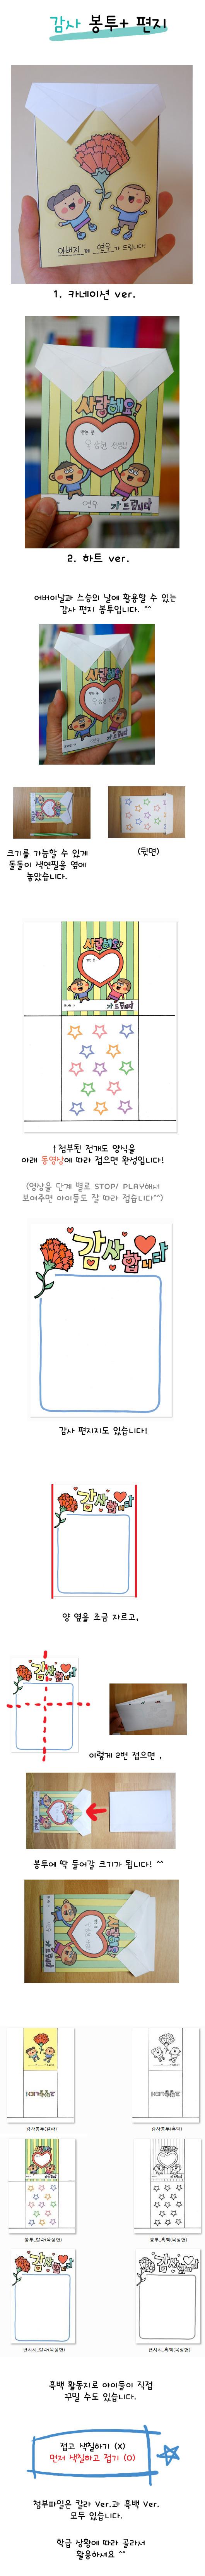 new 감사봉투+편지(어버이날,스승의날)